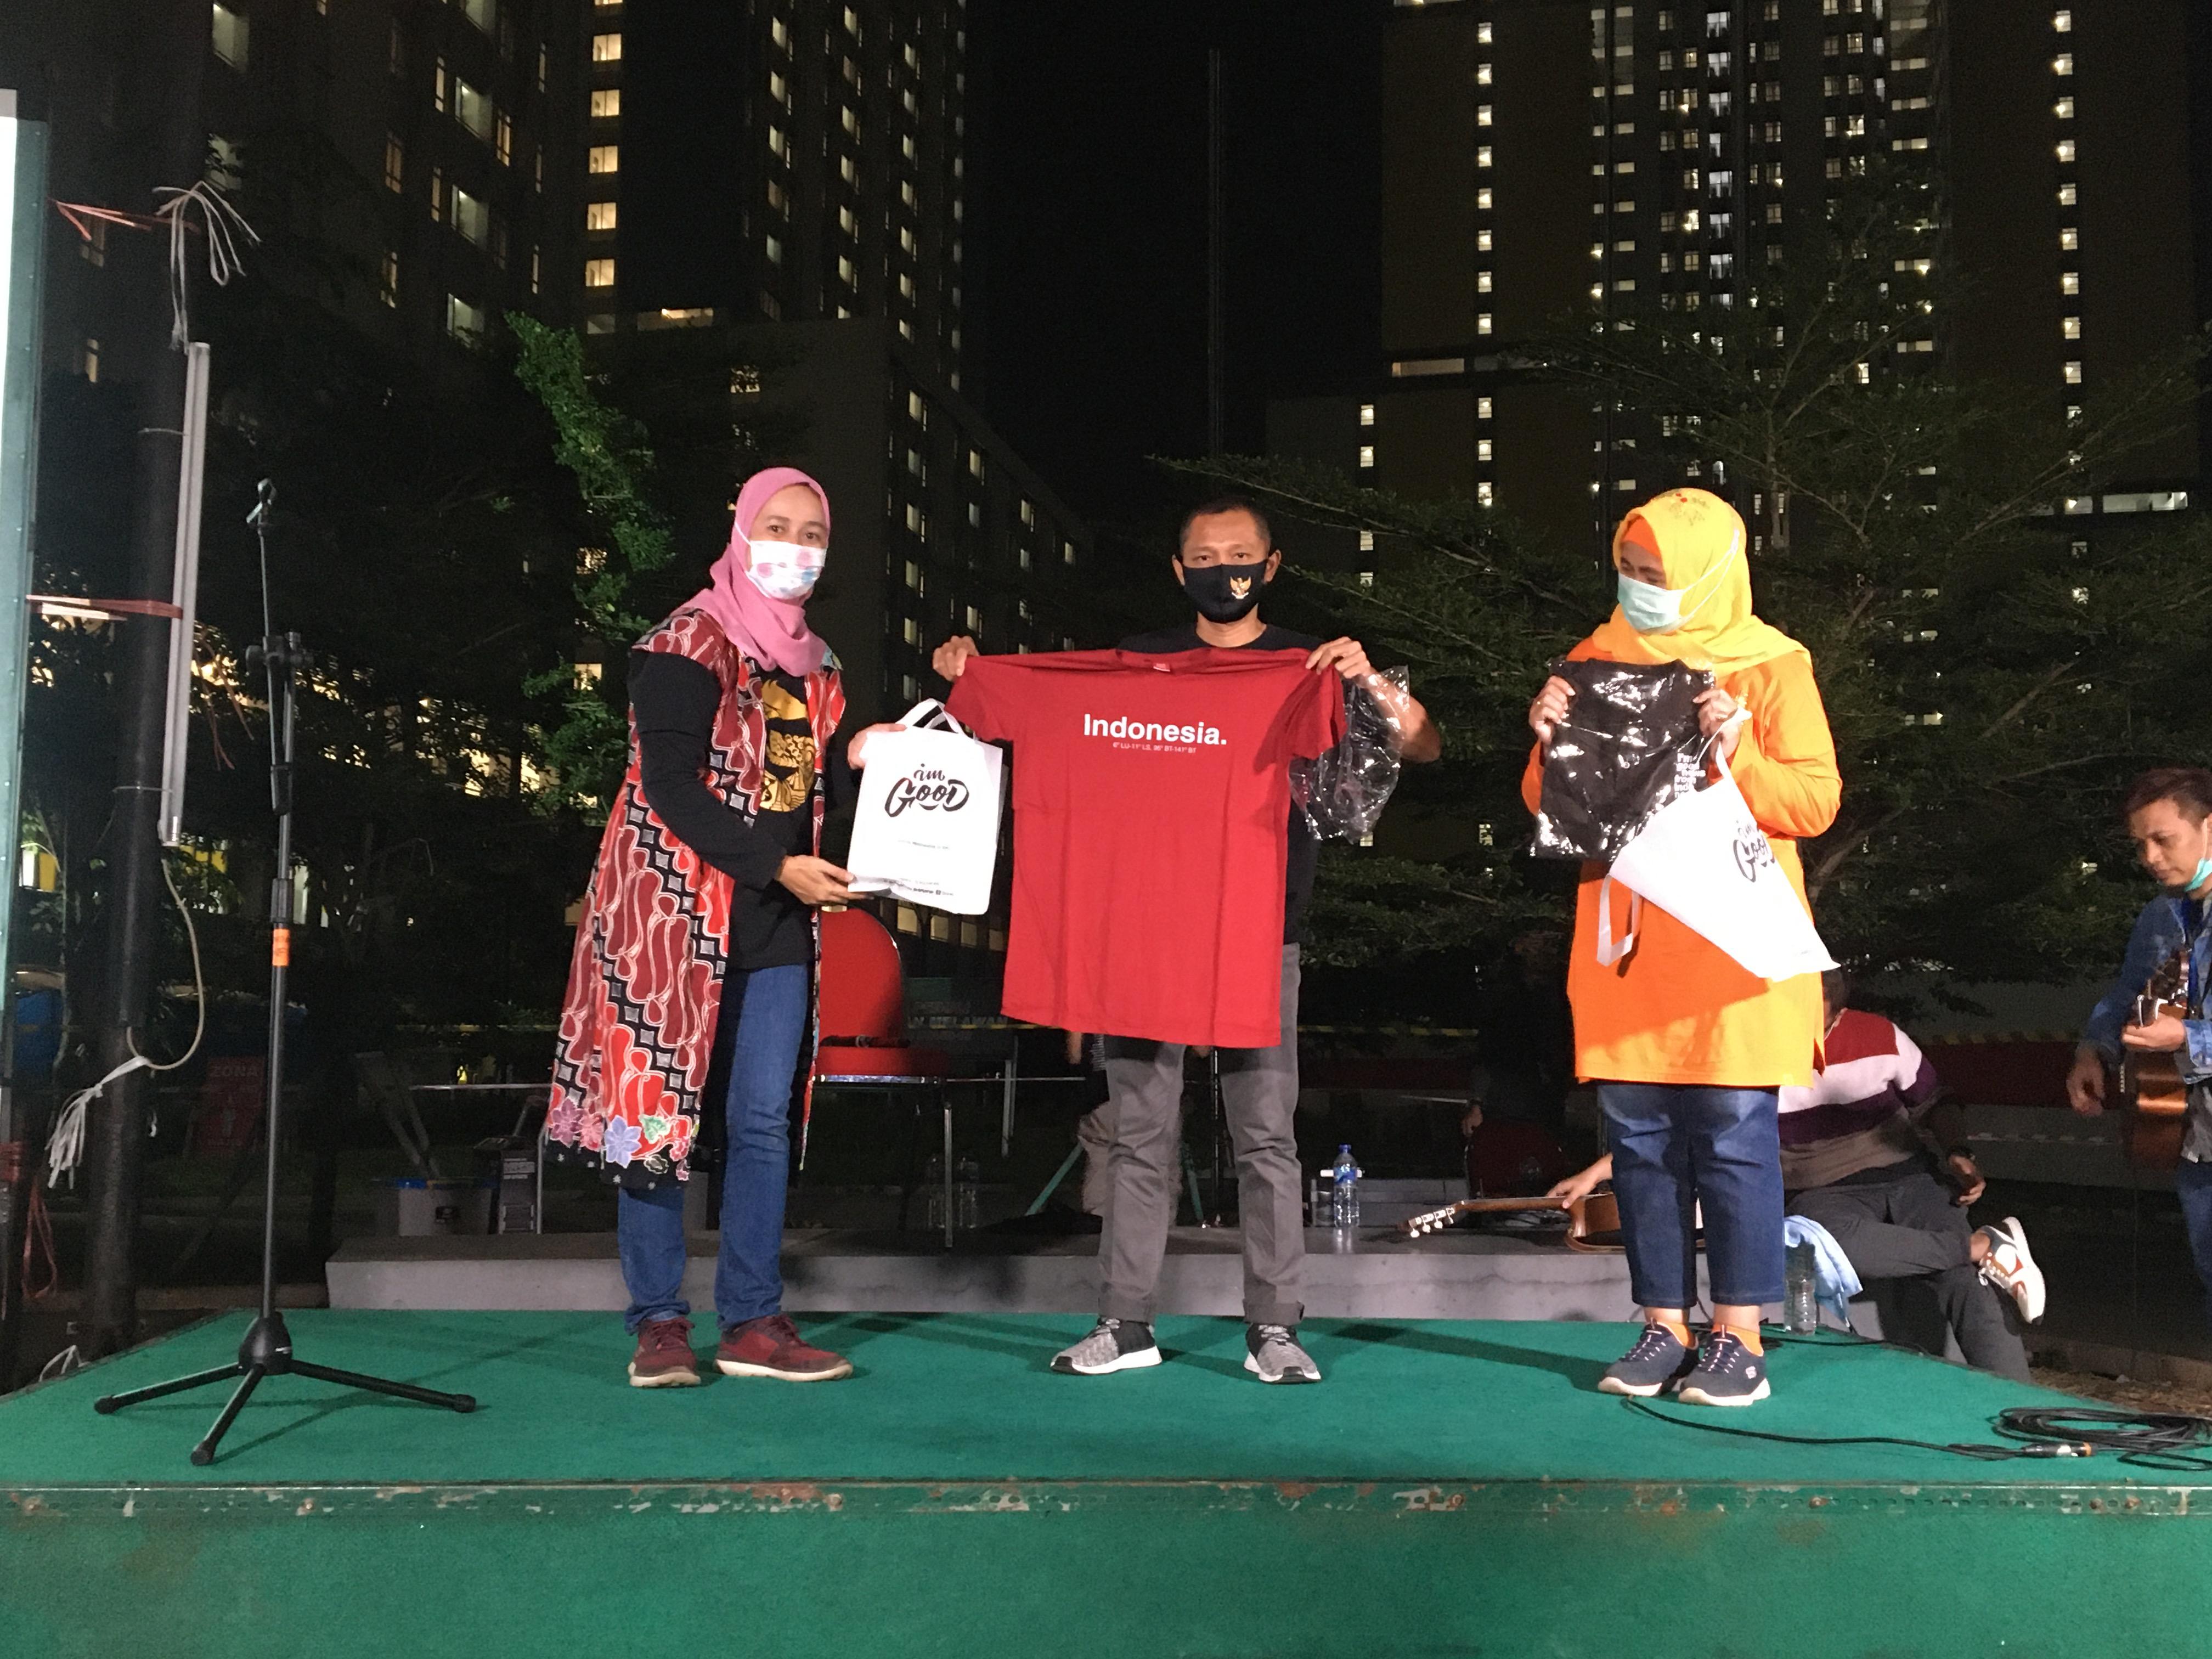 Komandan Lapangan RSDC Wisma Atlet, Letkol Laut (K) drg. M. Arifin Sp.Ort., M.Tr (Opsis) mendapatkan souvenir dari GNFI dalam acara peluncuran Lagu untuk Indonesia.